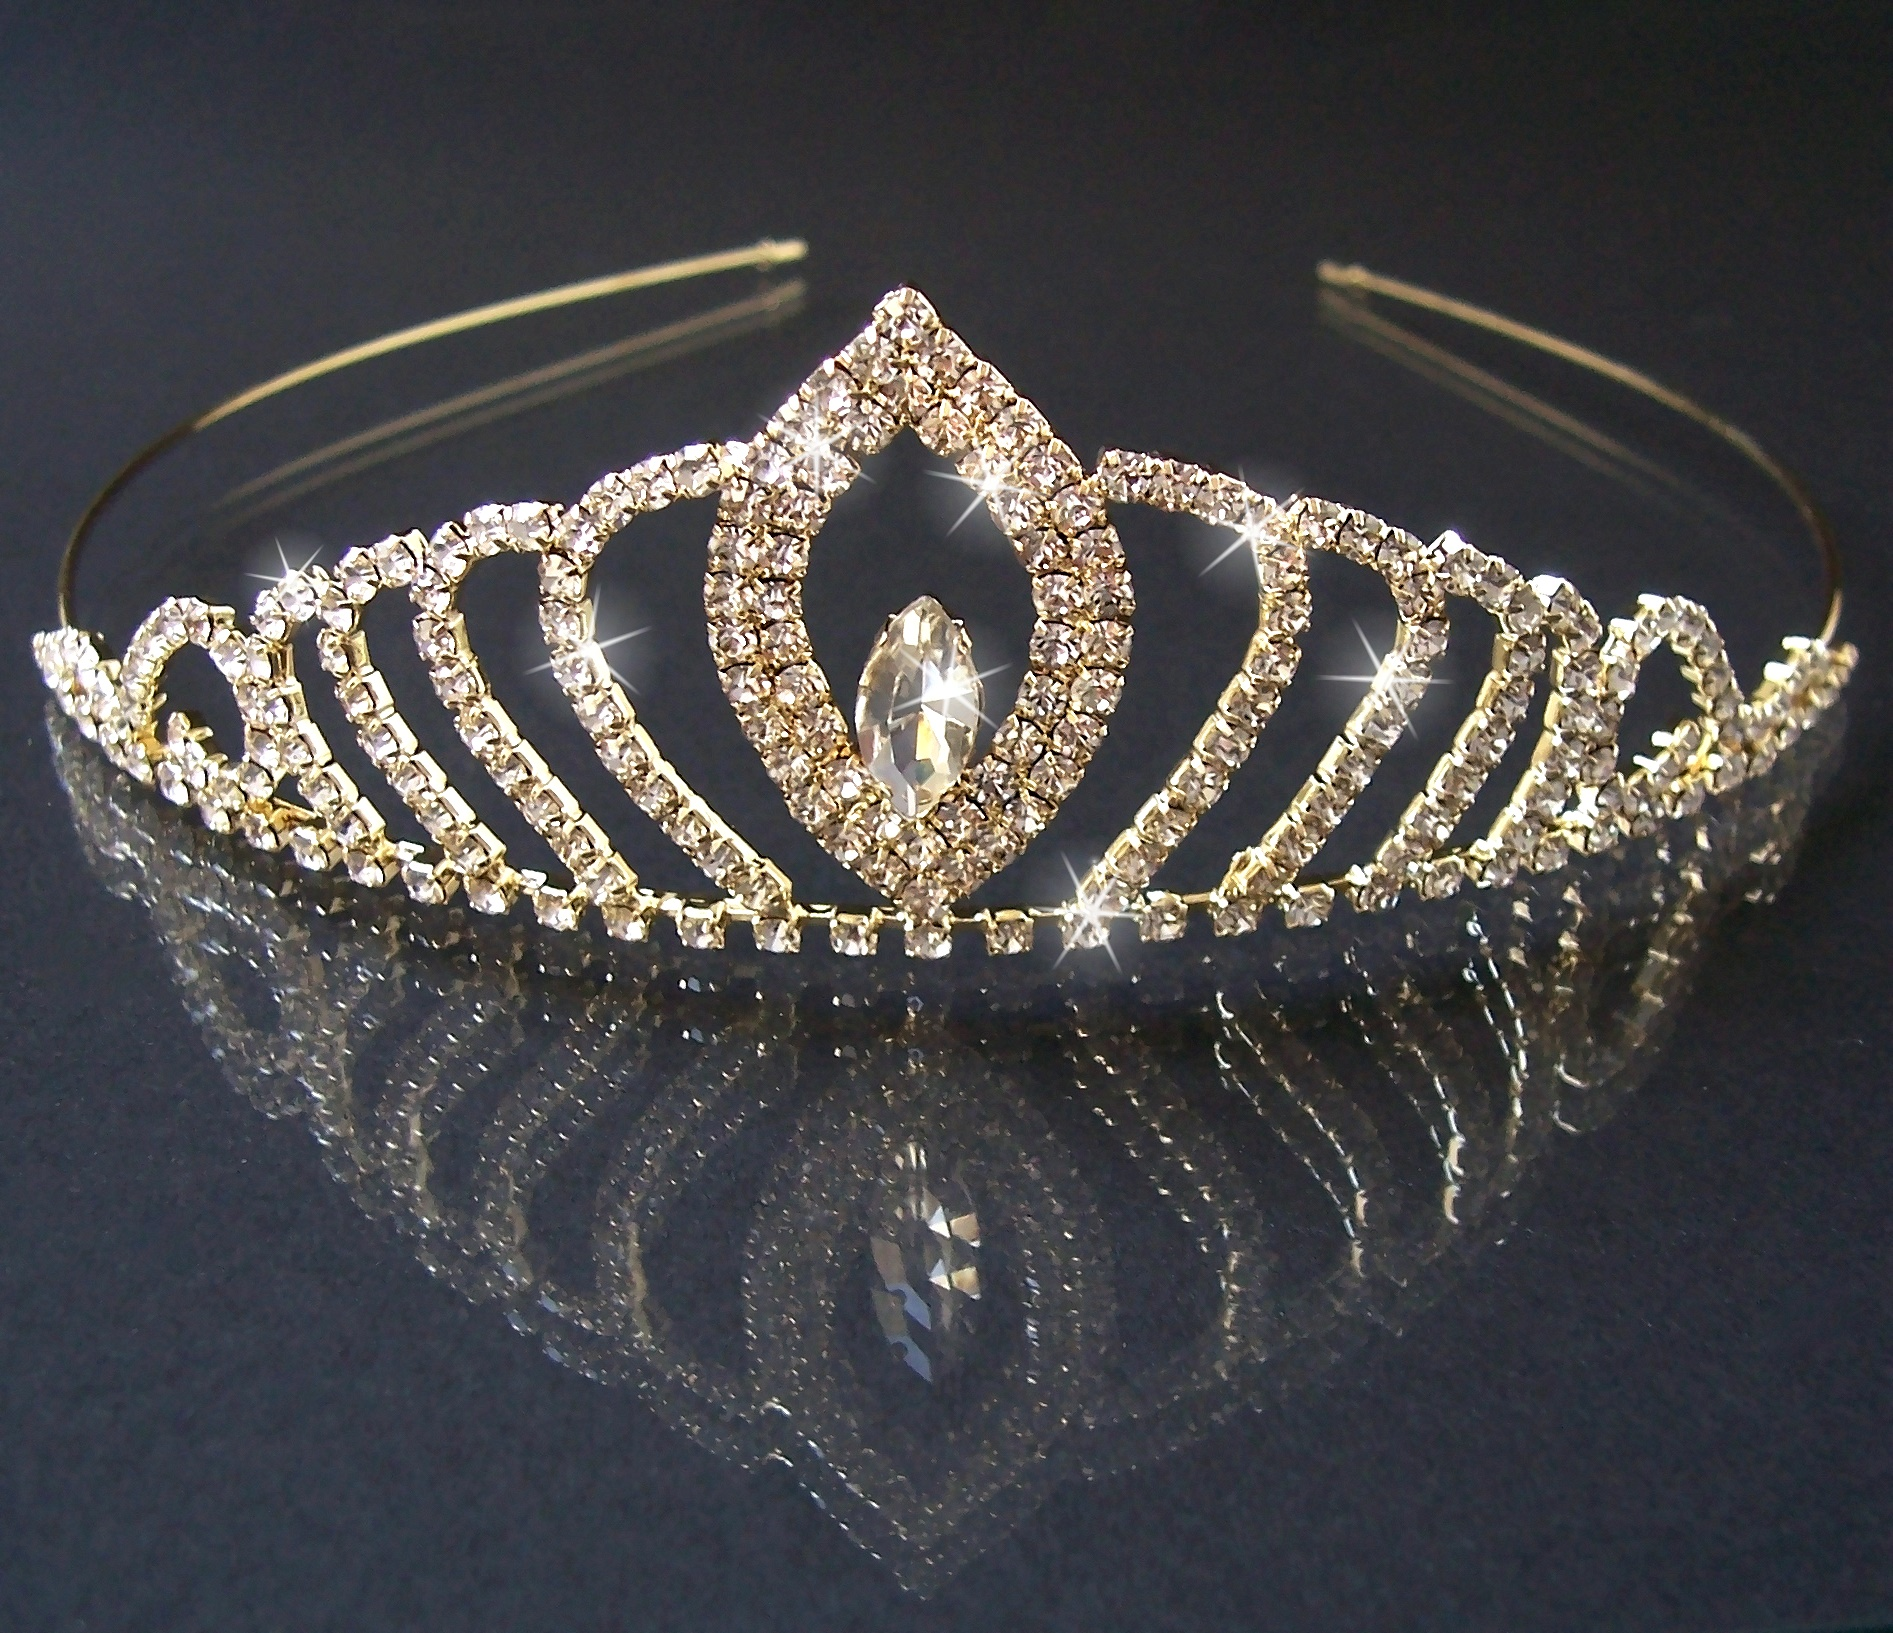 DIADEM Tiara Strass Gold Braut Schmuck Kopfschmuck Prinzessin H2314